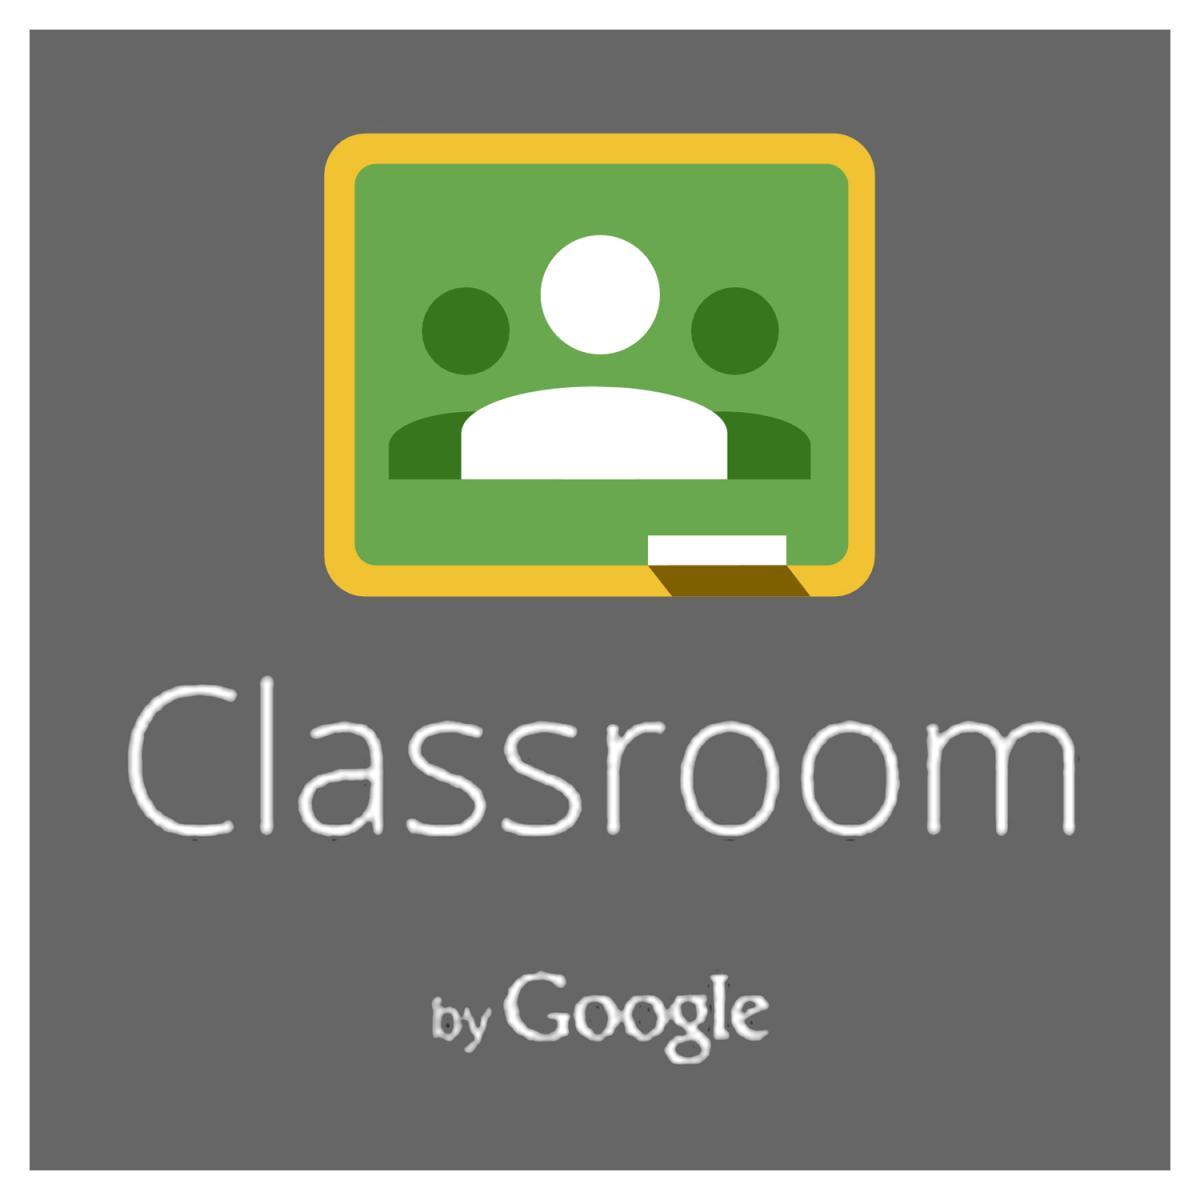 Classroom by Google